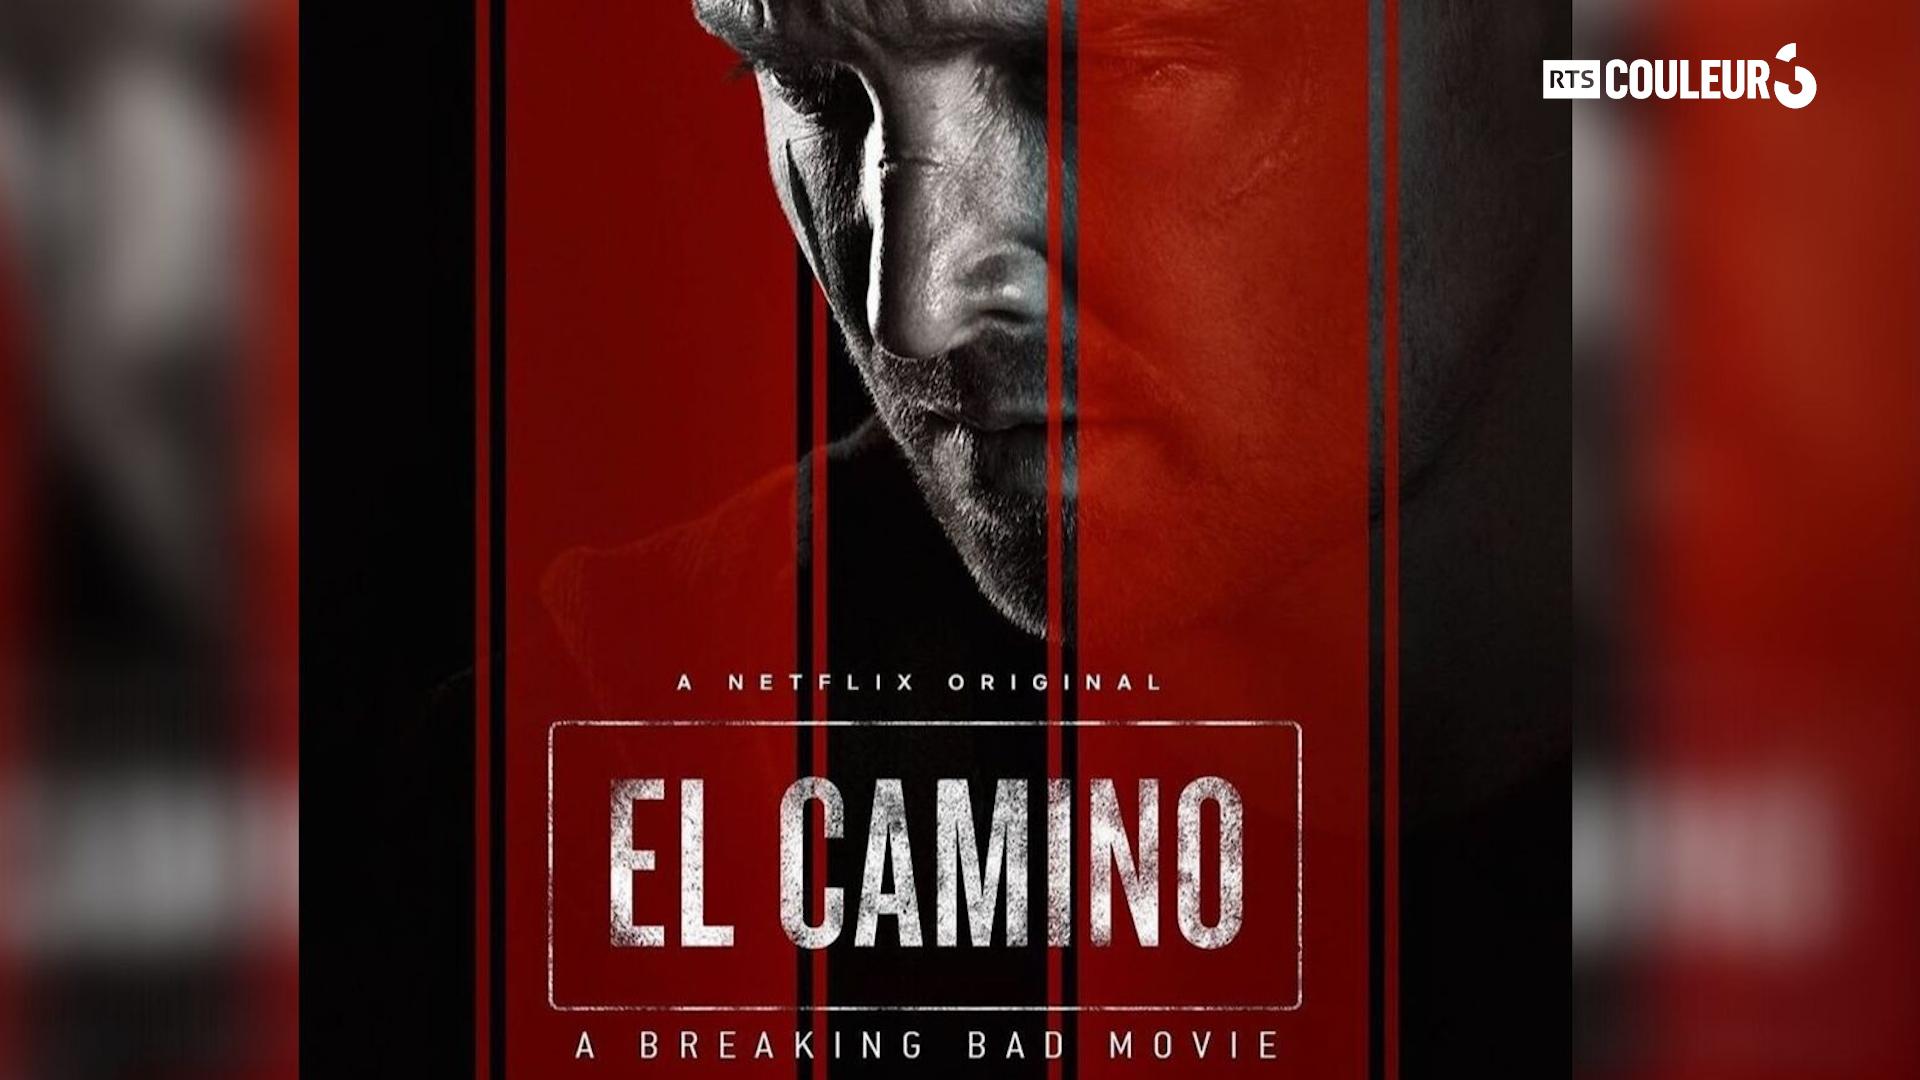 #034;El Camino#034;, le film adapté de la série #034;Breaking Bad#034; qui rend nostalgique